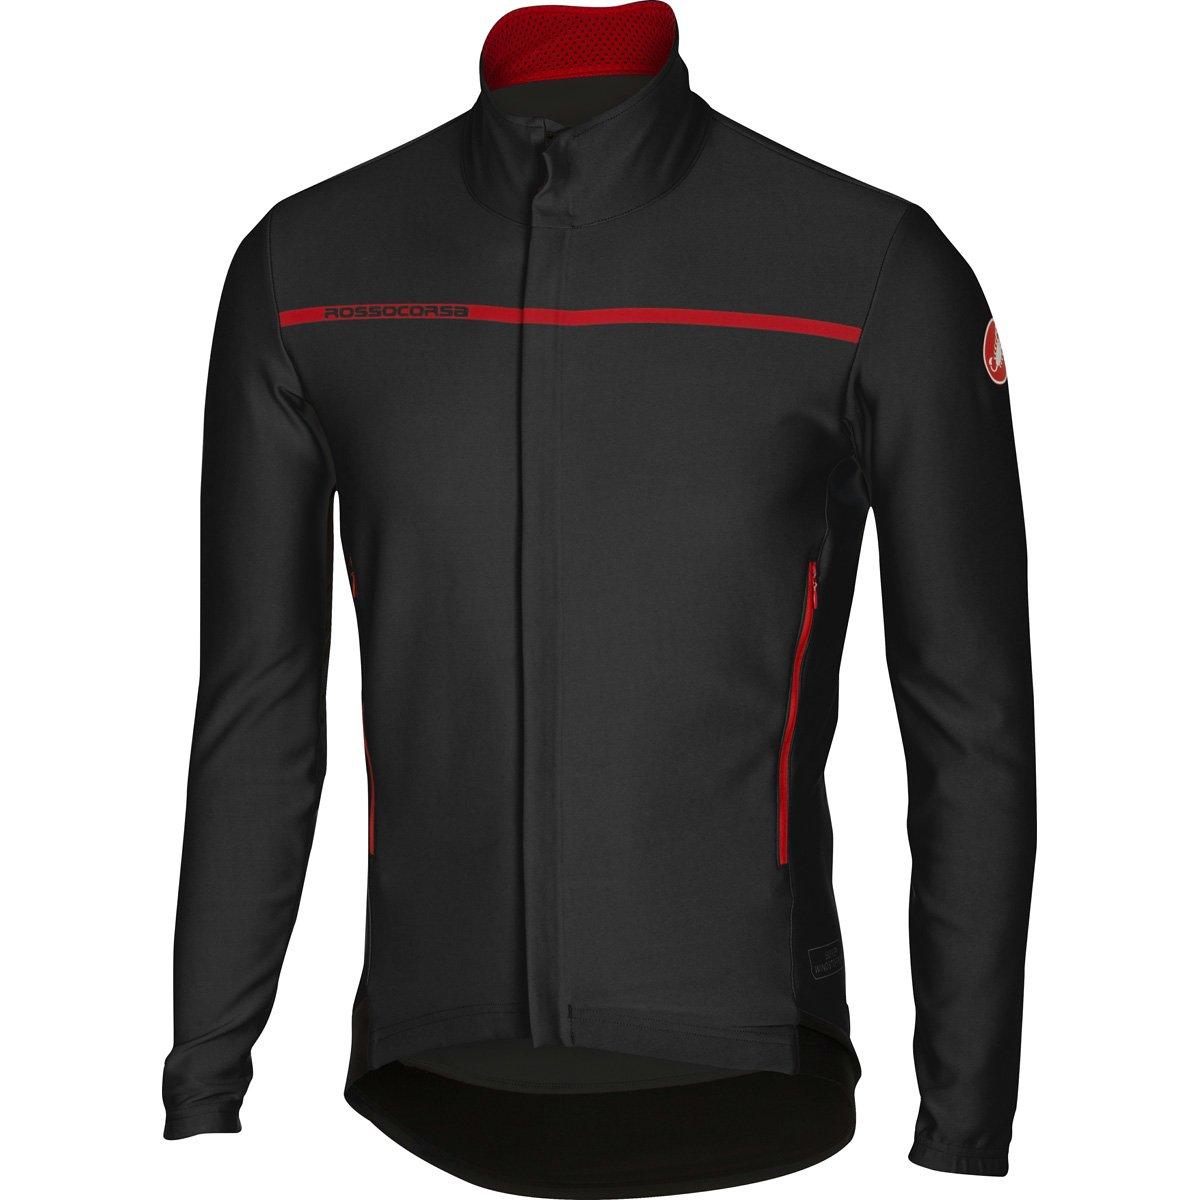 Amazon.com   Castelli 2016 17 Men s Perfetto Long Sleeve Cycling Jacket -  B16507   Sports   Outdoors 39def8874